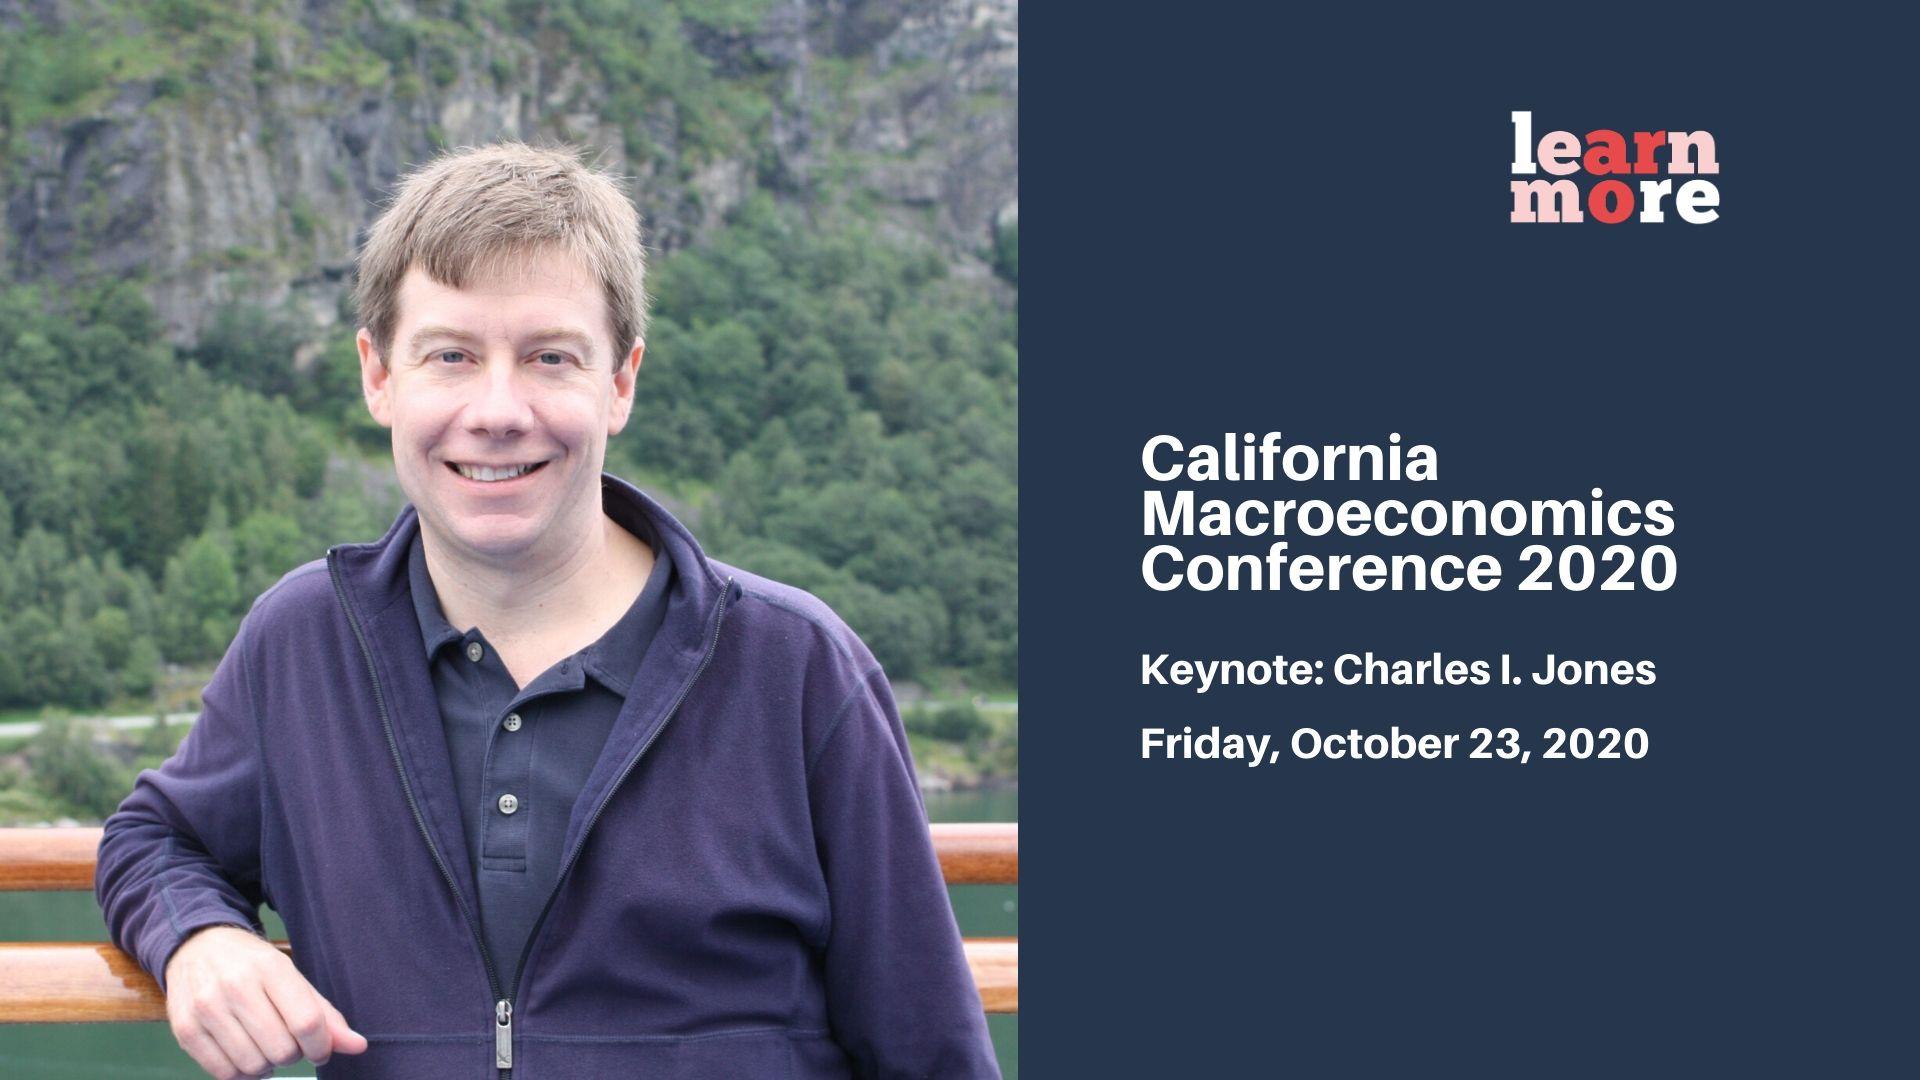 California Macroeconomics Conference 2020